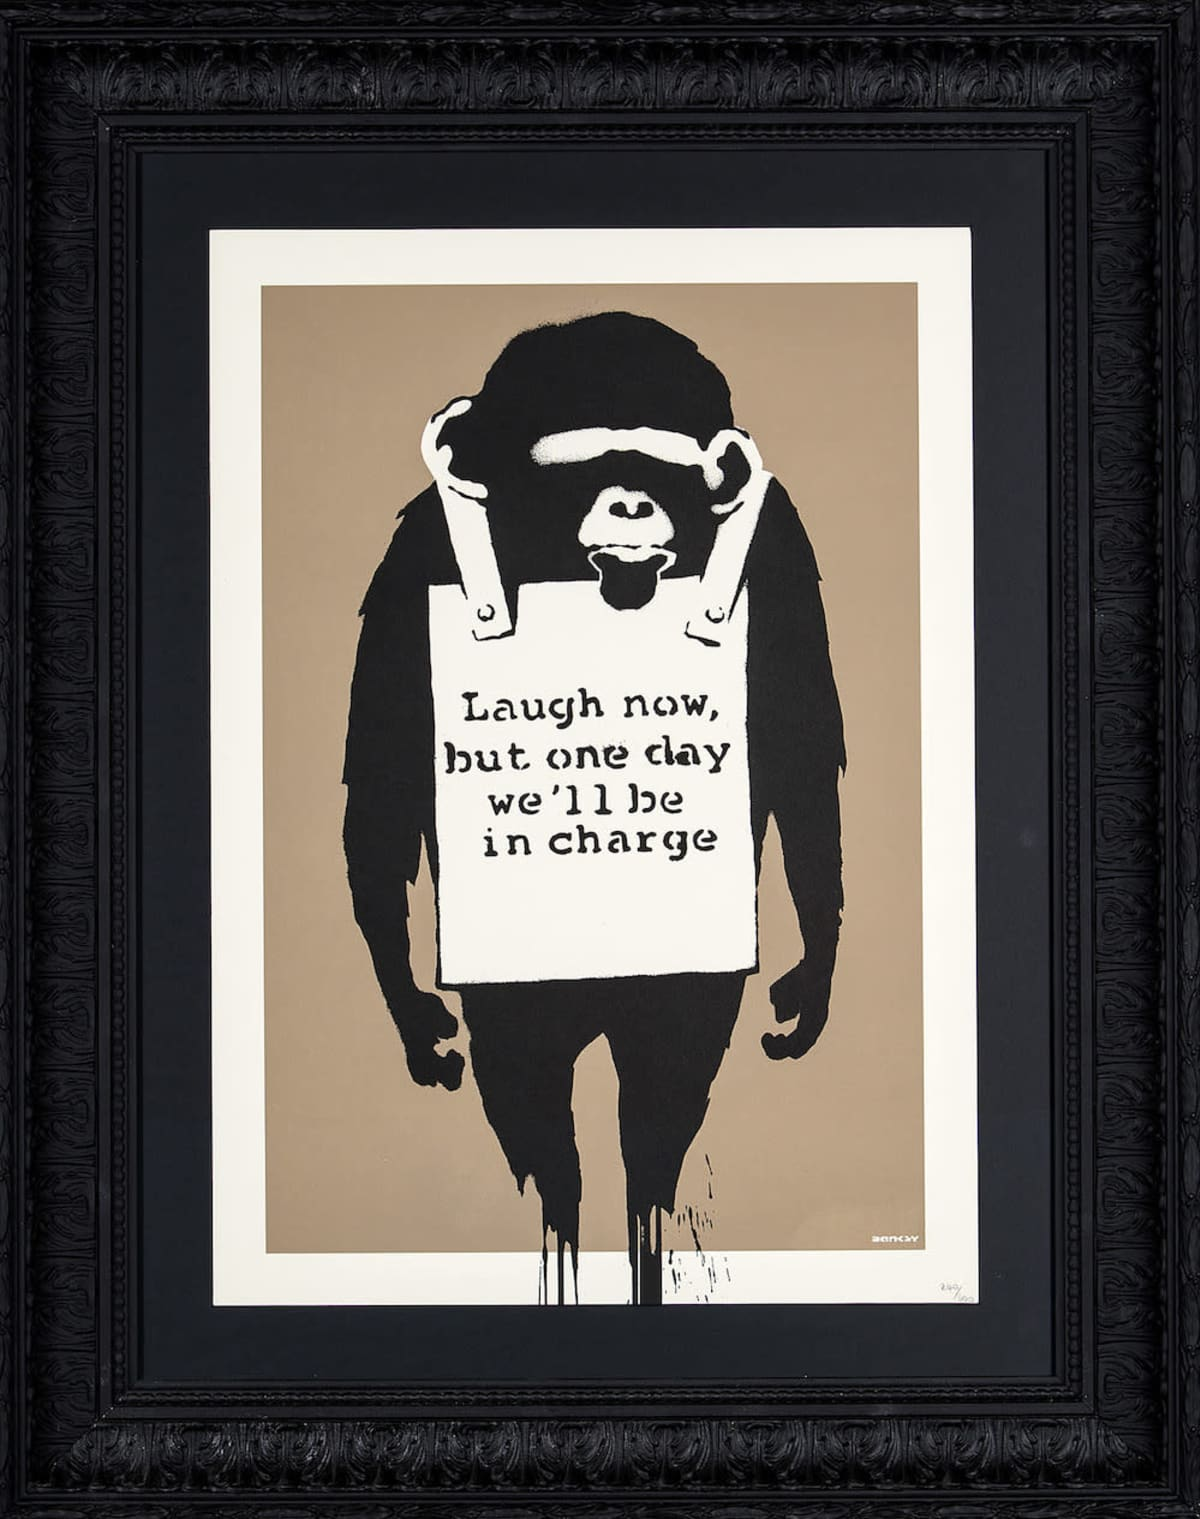 Banksyn teos Laugh now.